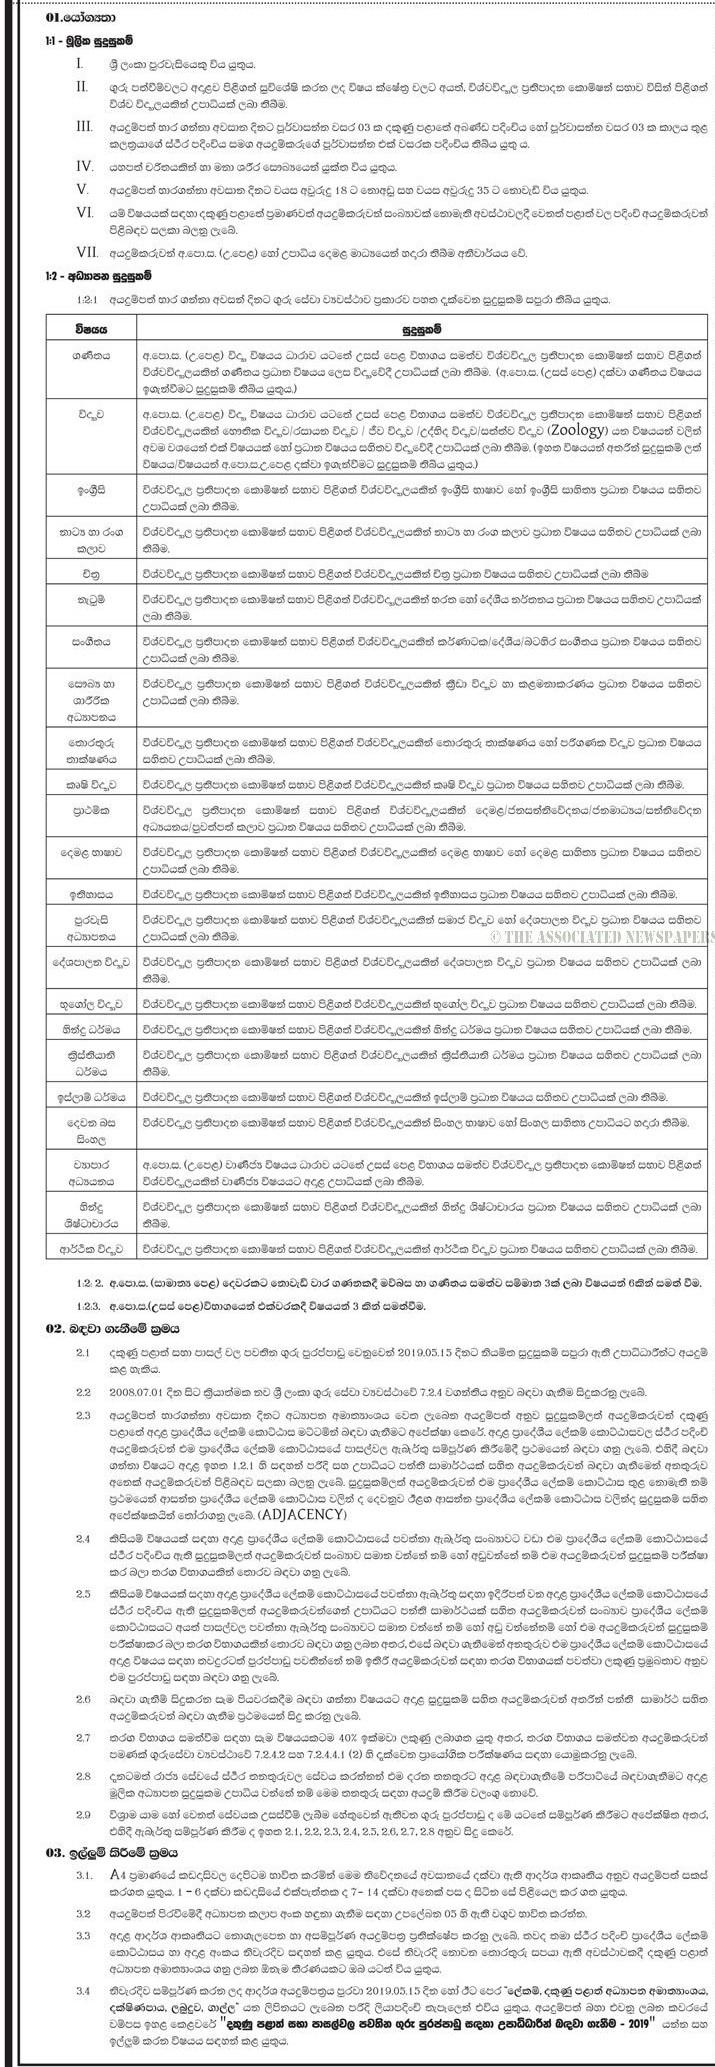 Graduates Teacher Vacancies - Southern Provincial Ministry of Education